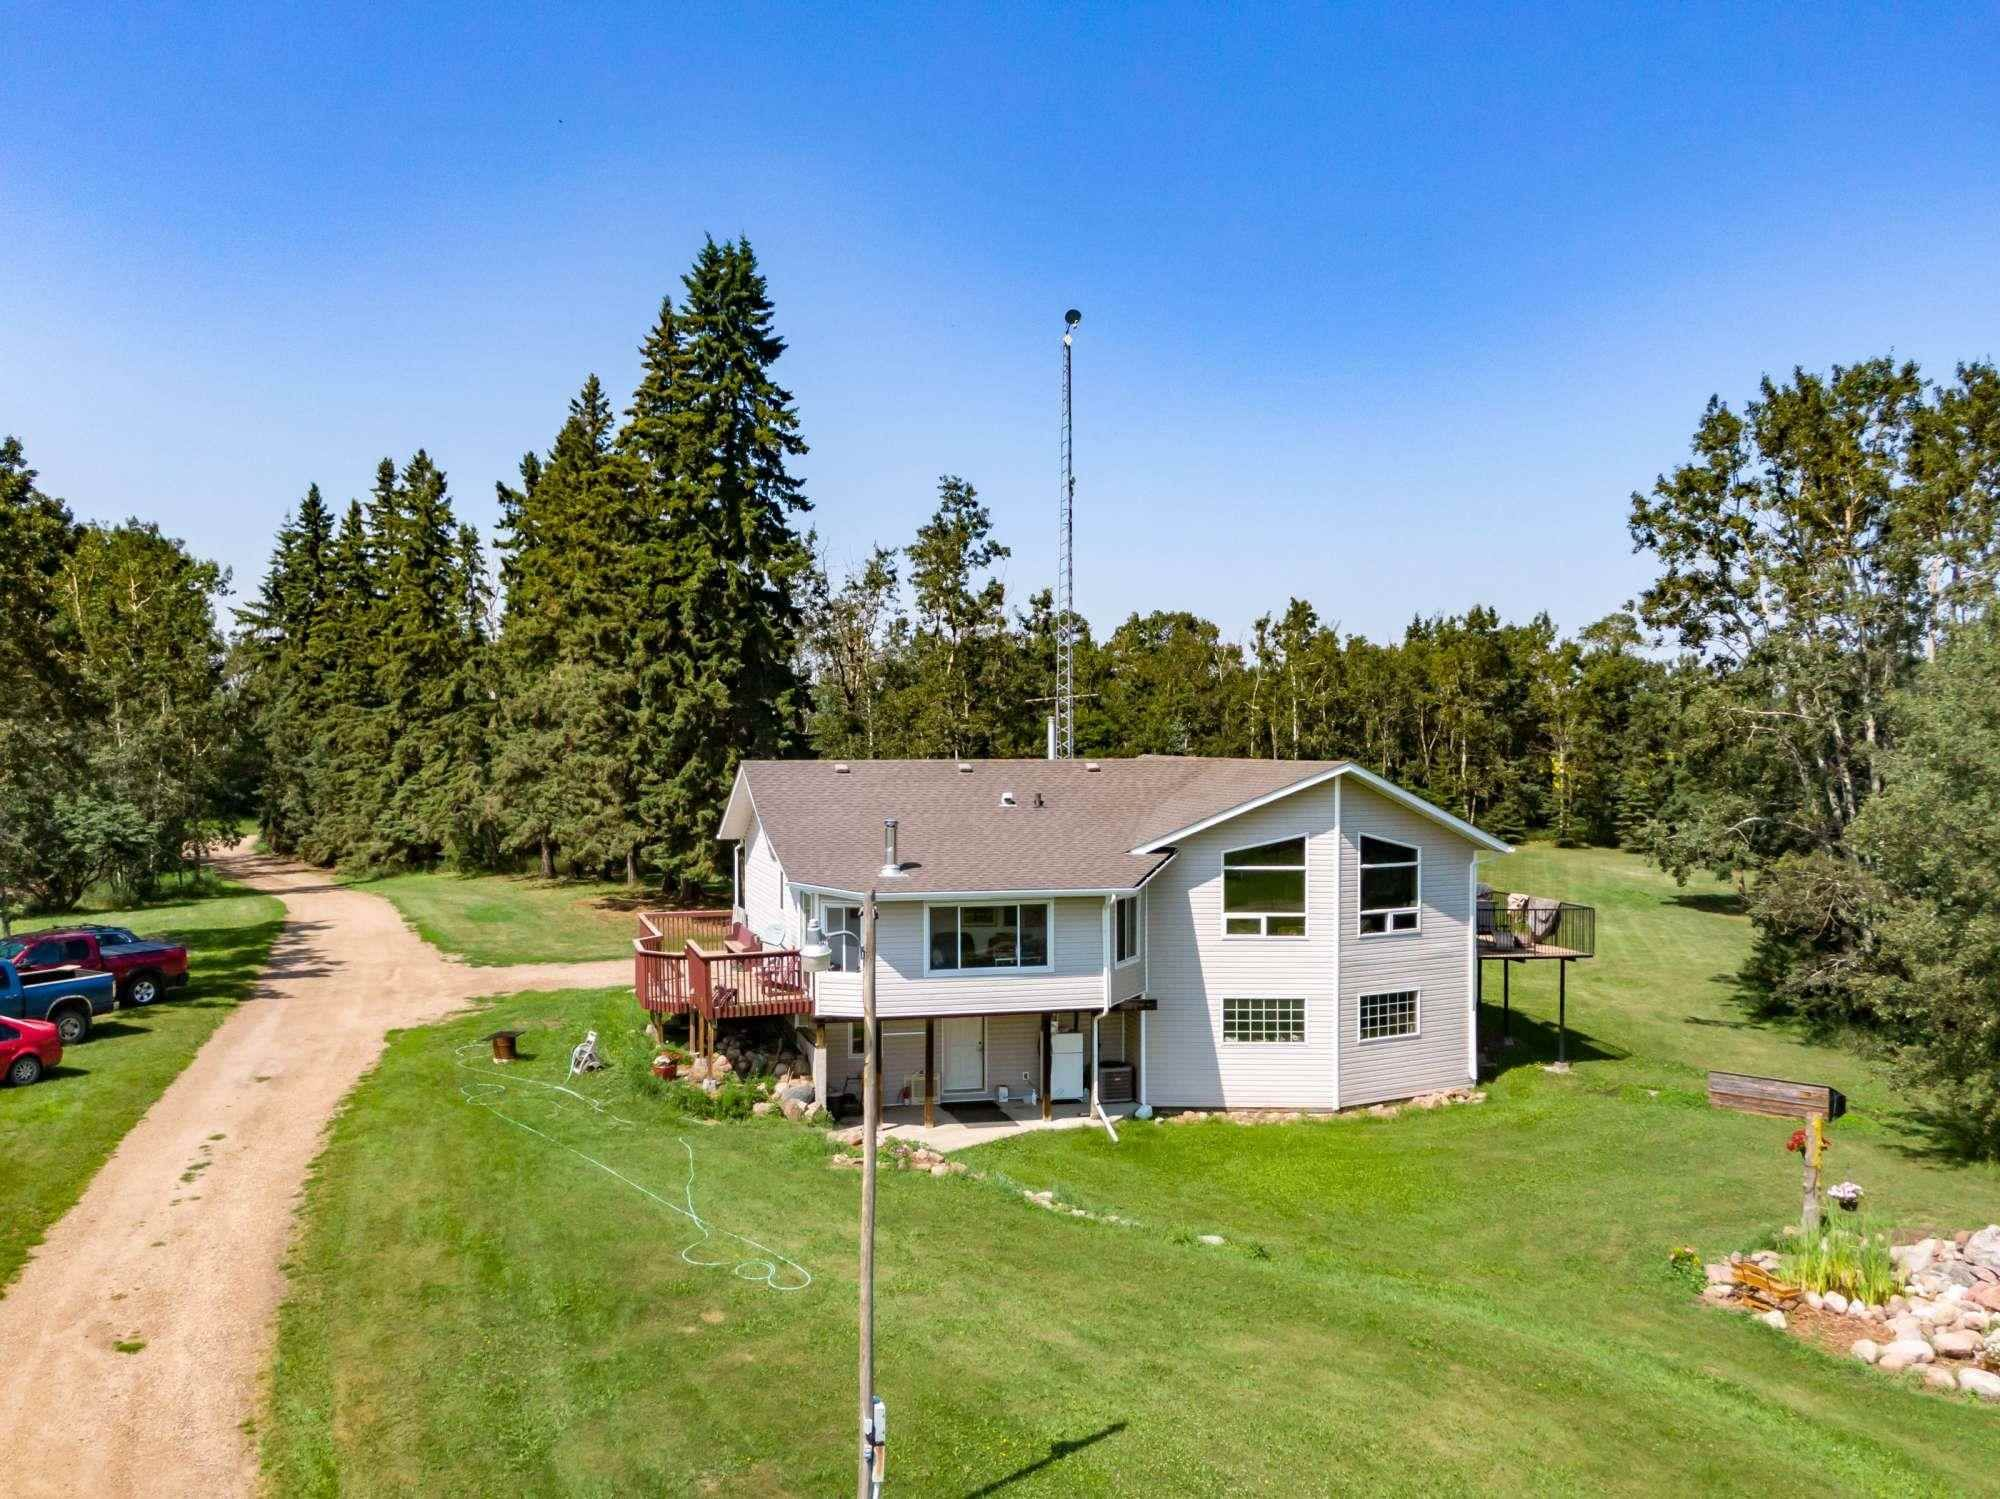 Main Photo: 461017A RR 262: Rural Wetaskiwin County House for sale : MLS®# E4255011